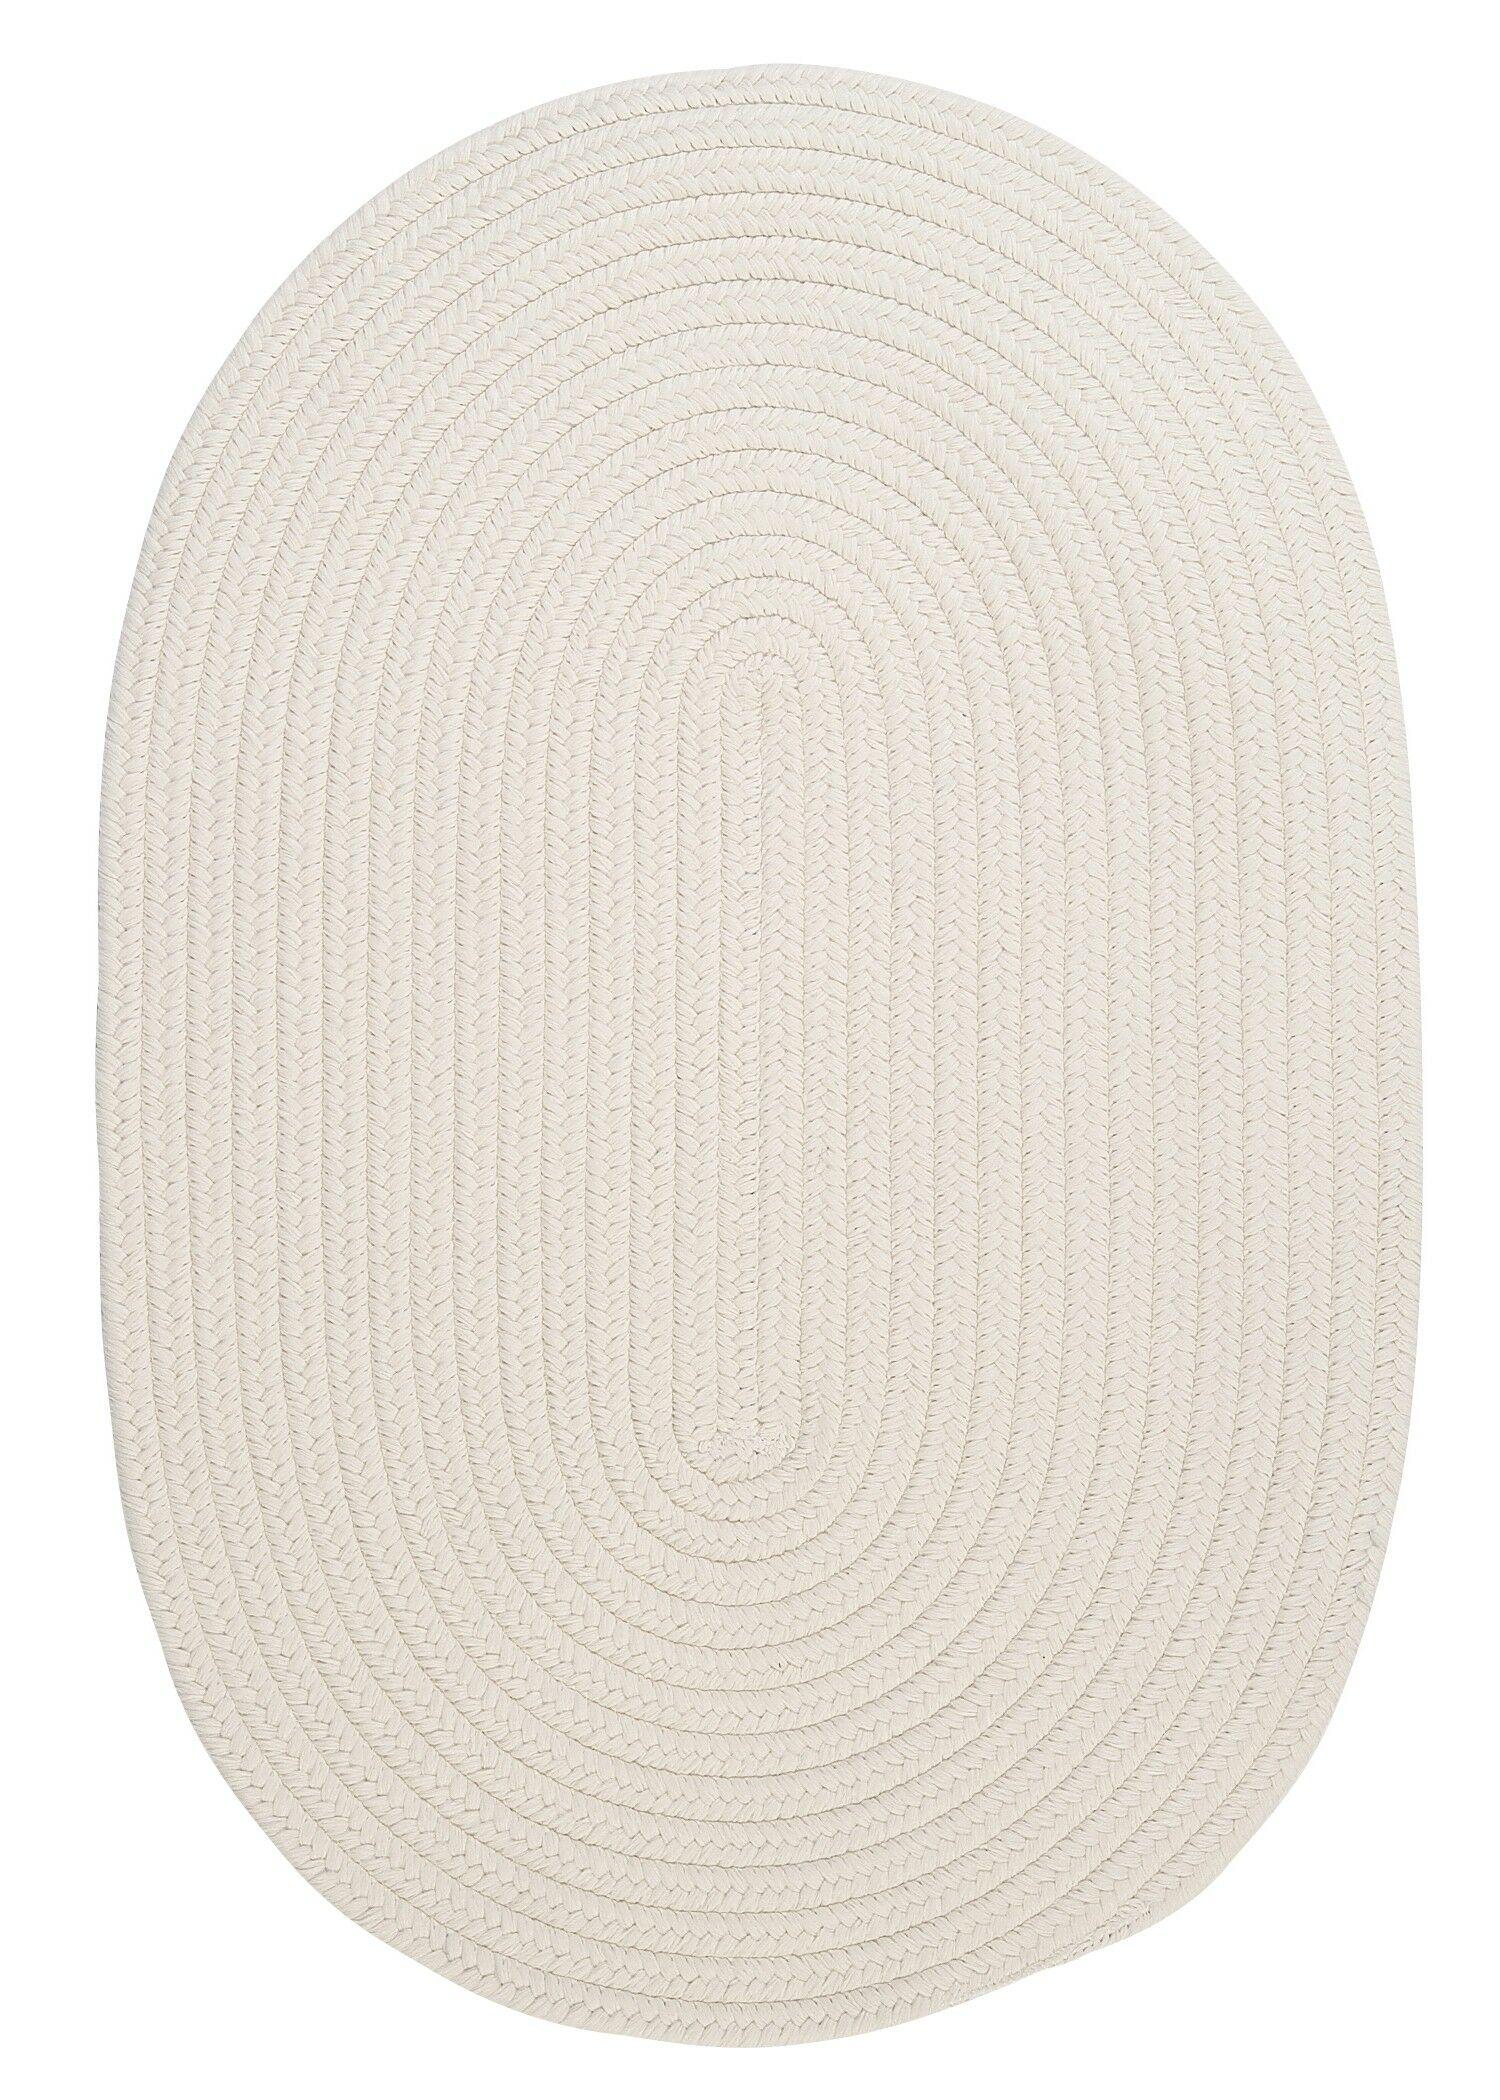 Boca Raton White Indoor/Outdoor Area Rug Rug Size: Oval 7' x 9'